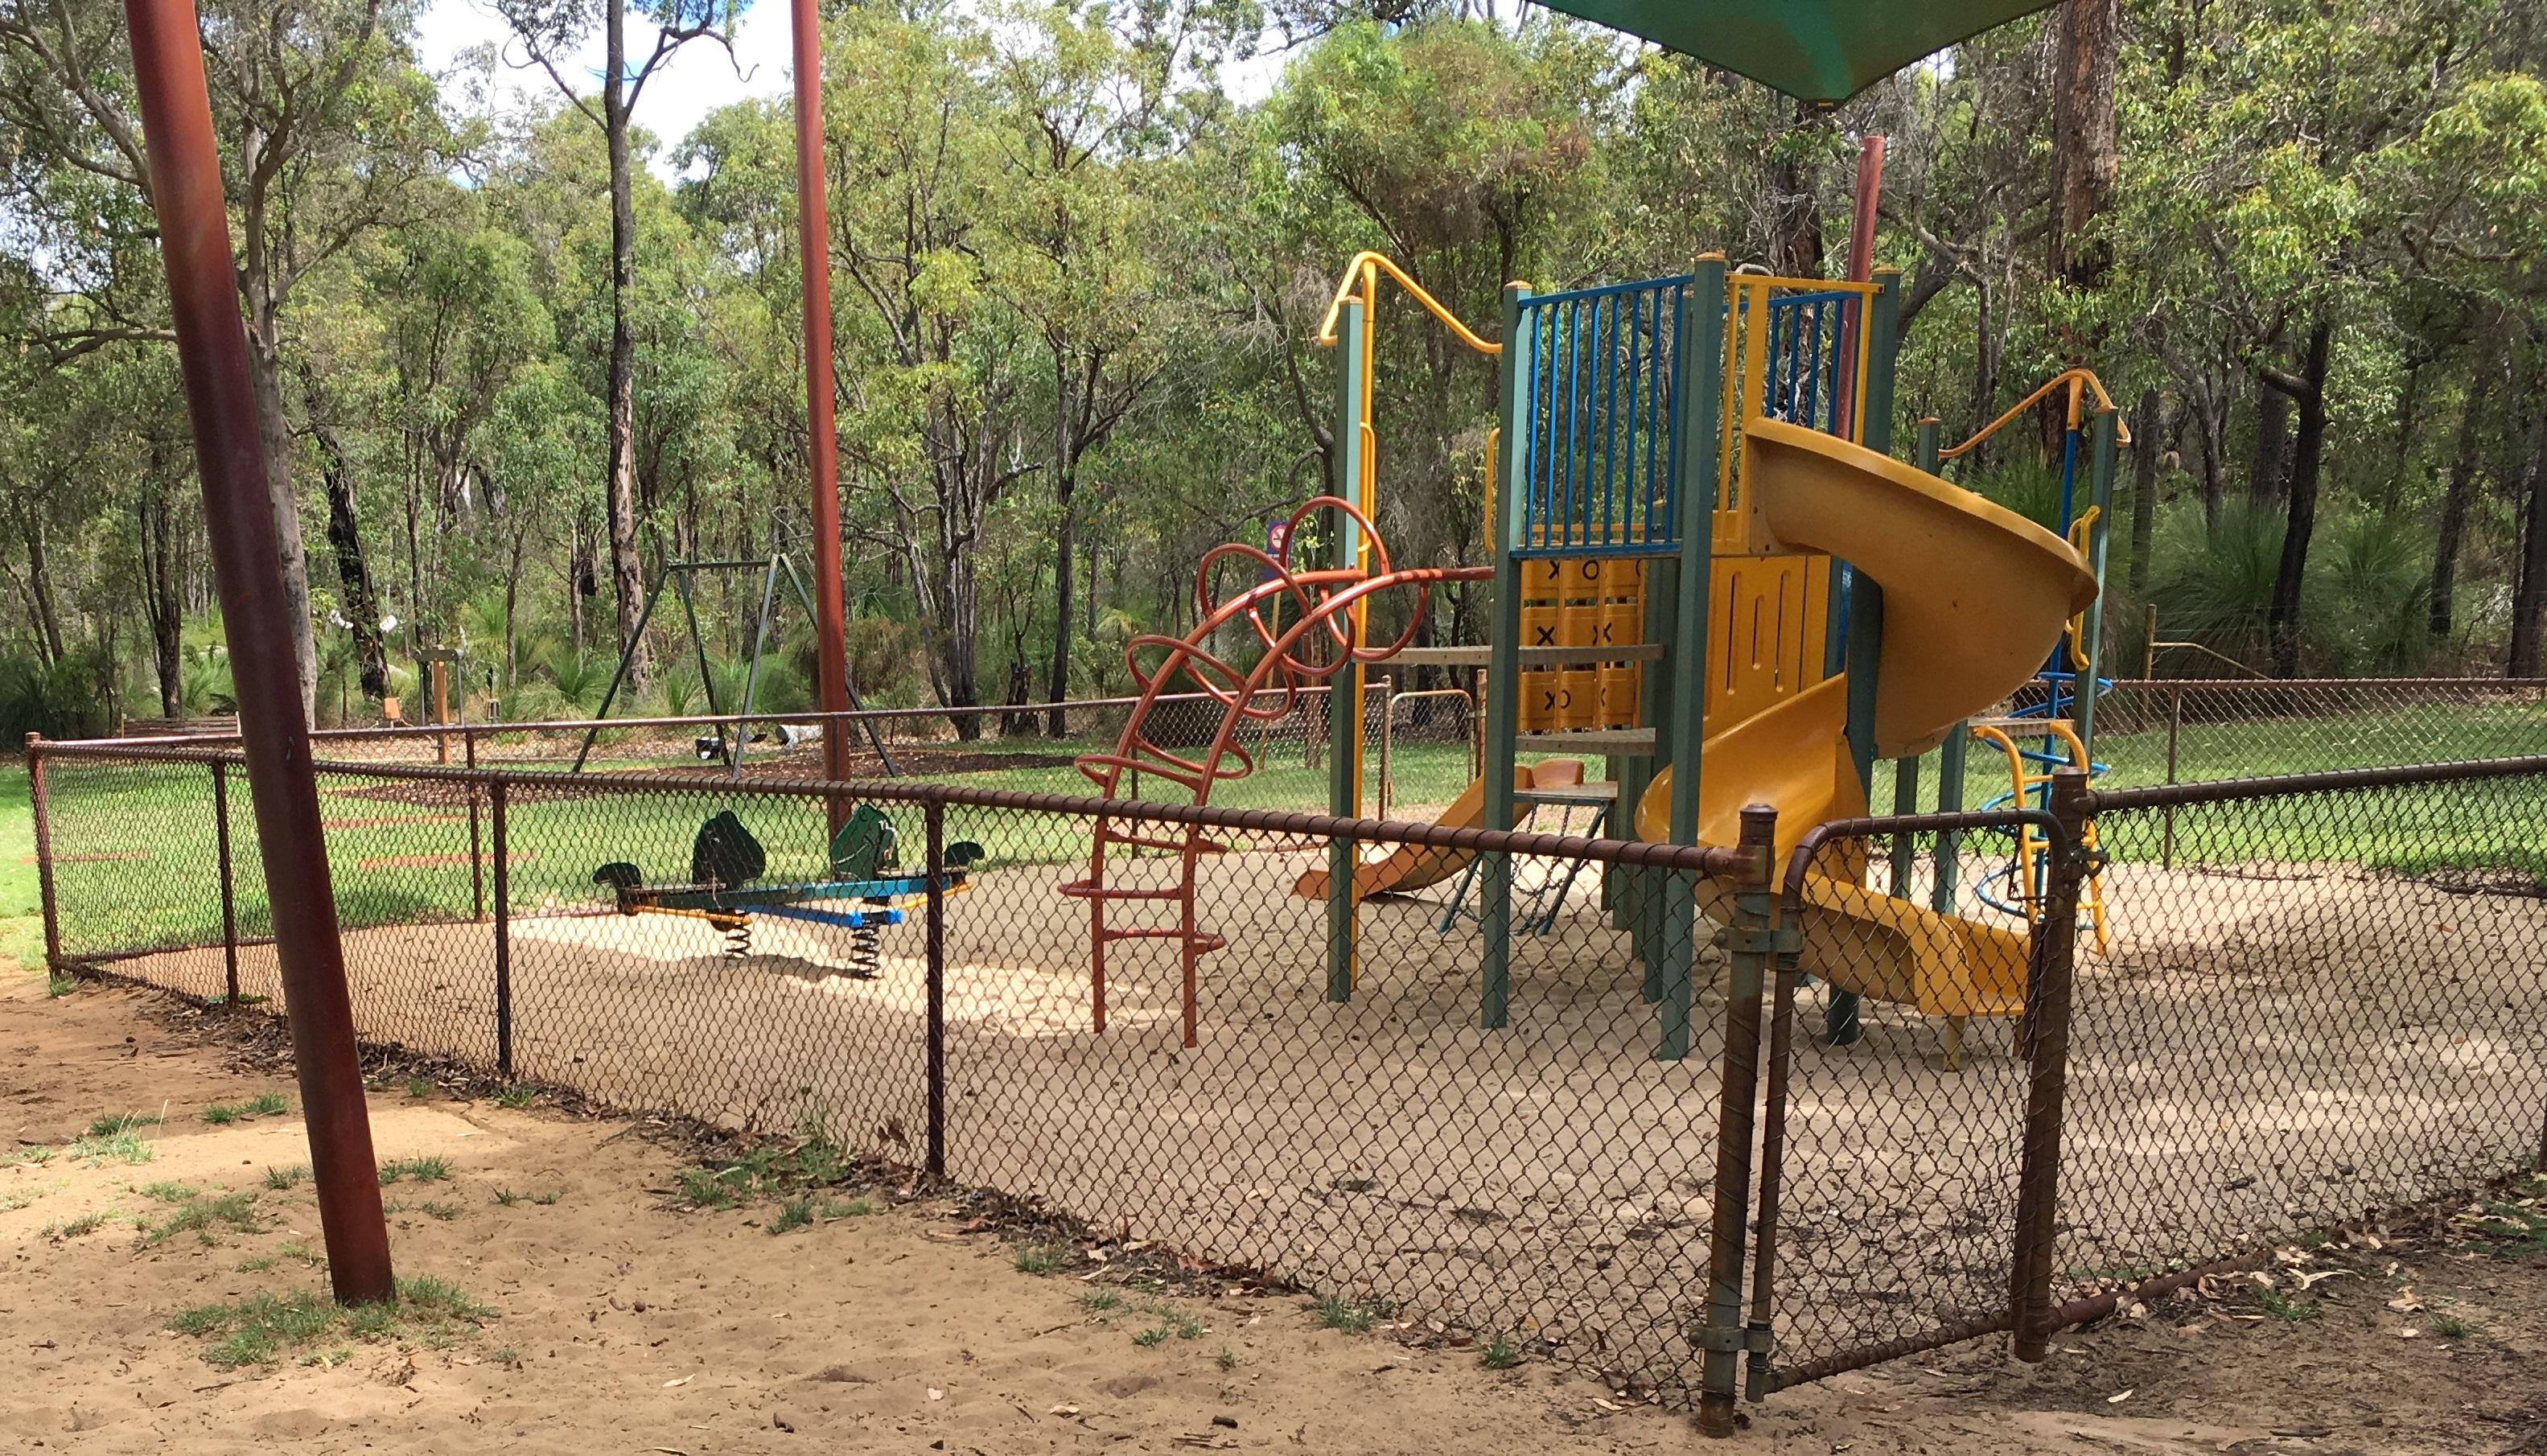 Samson existing playground cropped